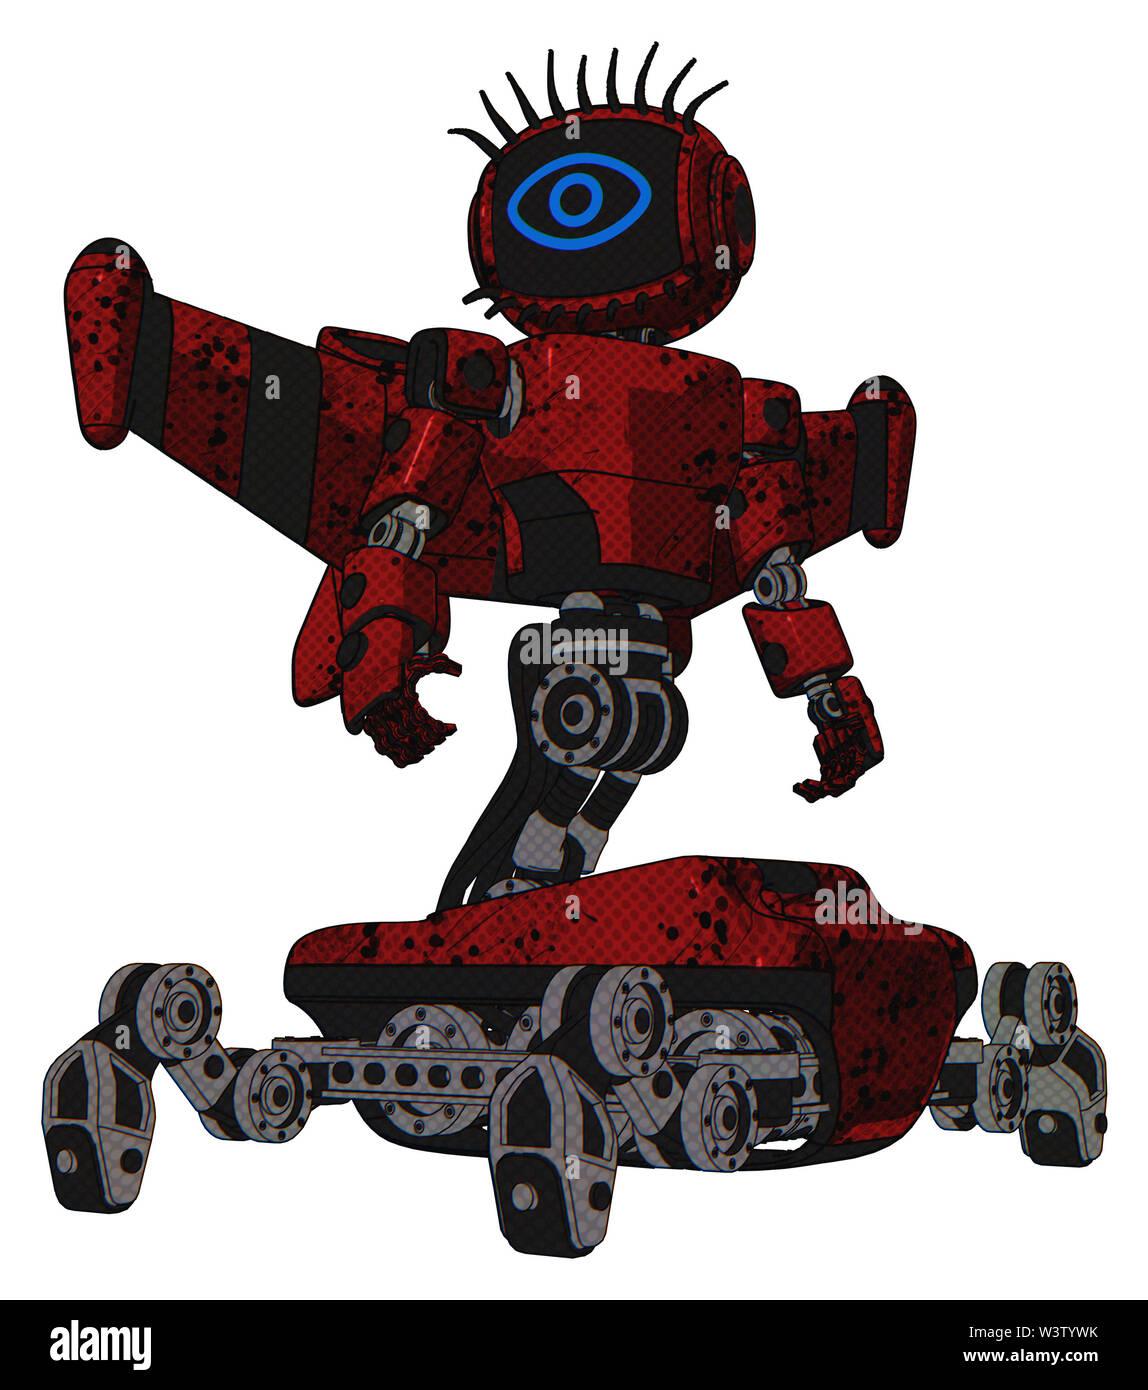 Bot containing elements: digital display head, large eye, eye lashes deco, light chest exoshielding, prototype exoplate chest, stellar jet wing rocket - Stock Image